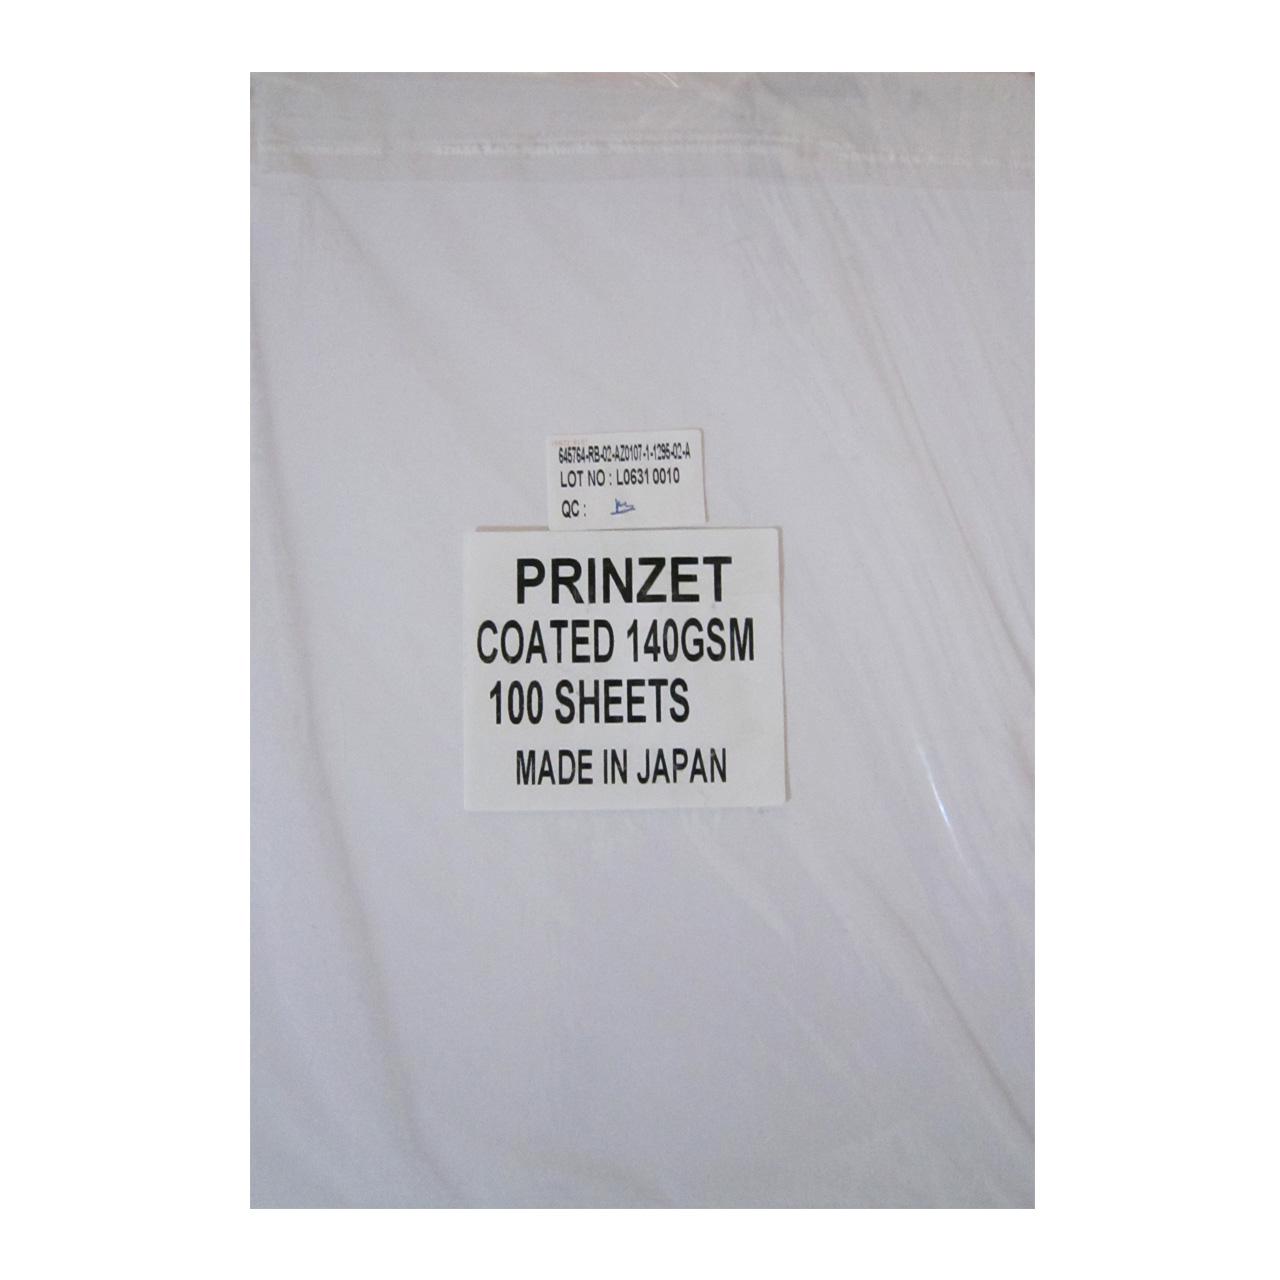 کاغذ چاپ عکس بدون گلاسه (کوتد) پرینزت 140 گرمی سایز A4 بسته 100 عددی